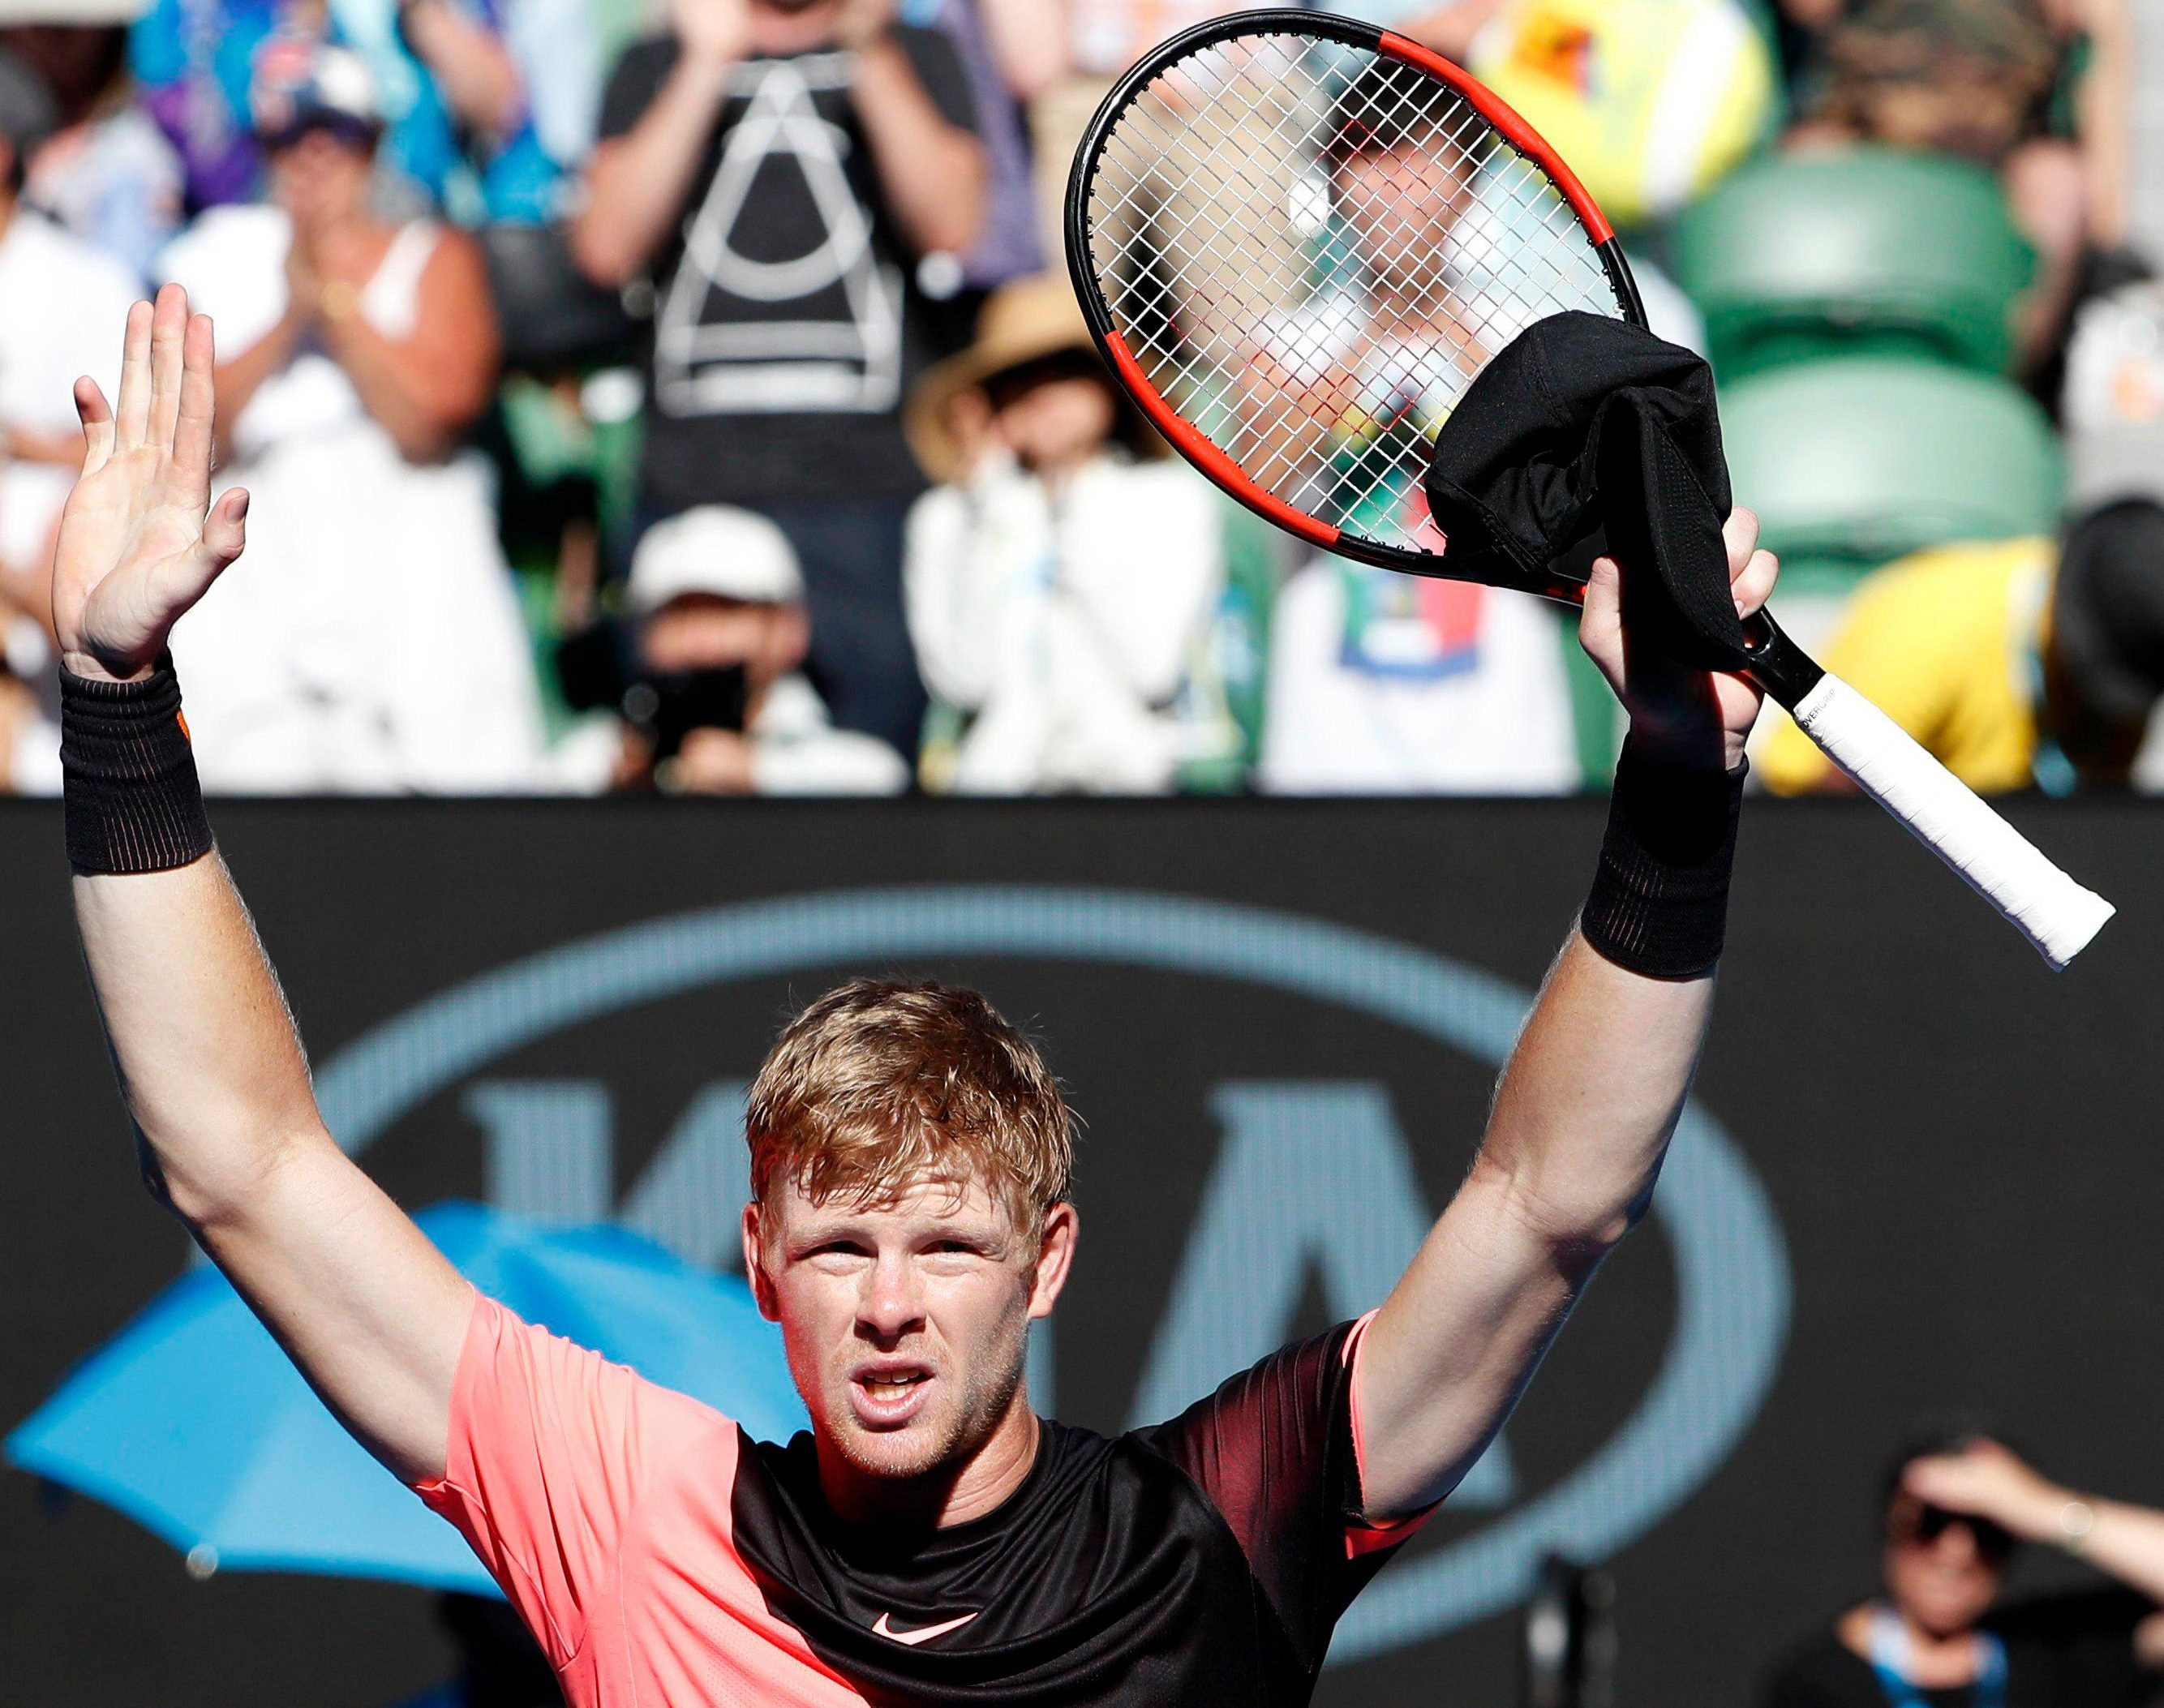 Edmund celebrates his win over Grigor Dimitrov to reach the last four